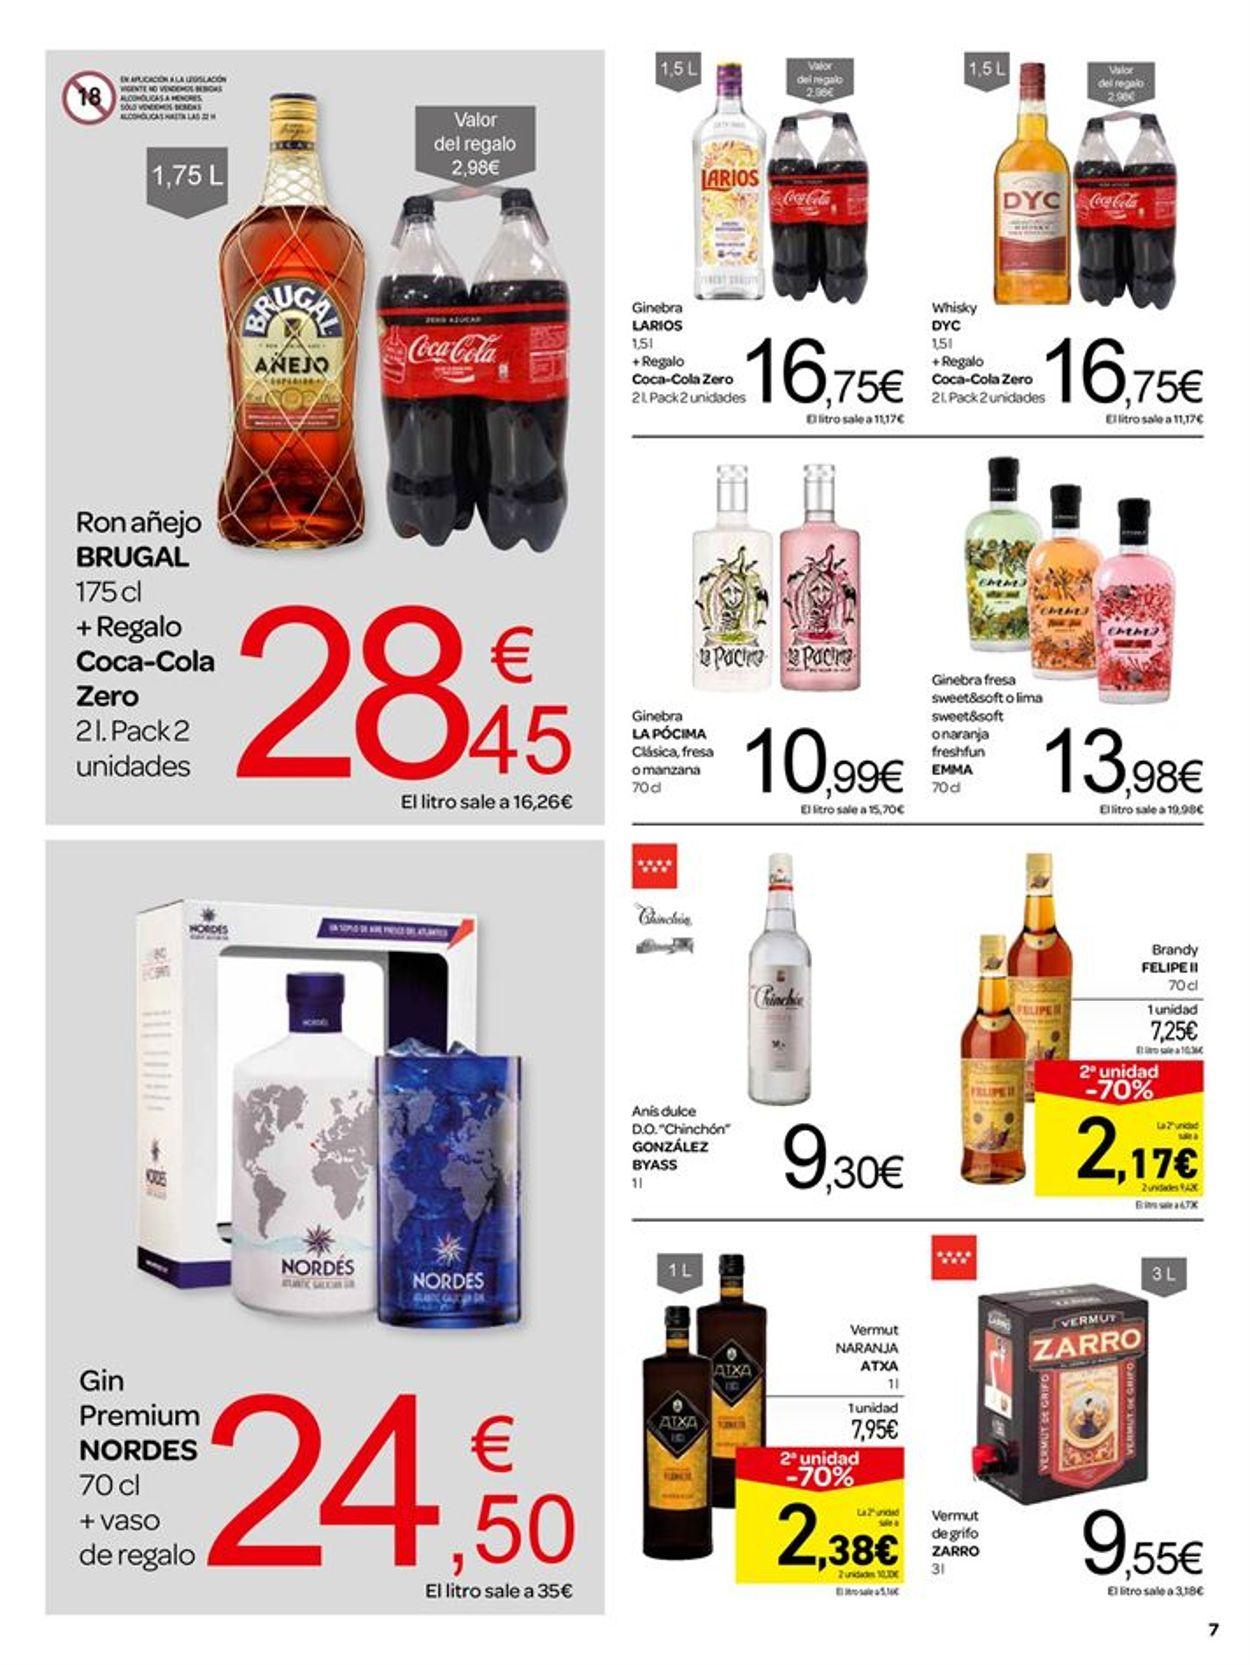 Carrefour Folleto - 10.07-24.07.2019 (Página 7)